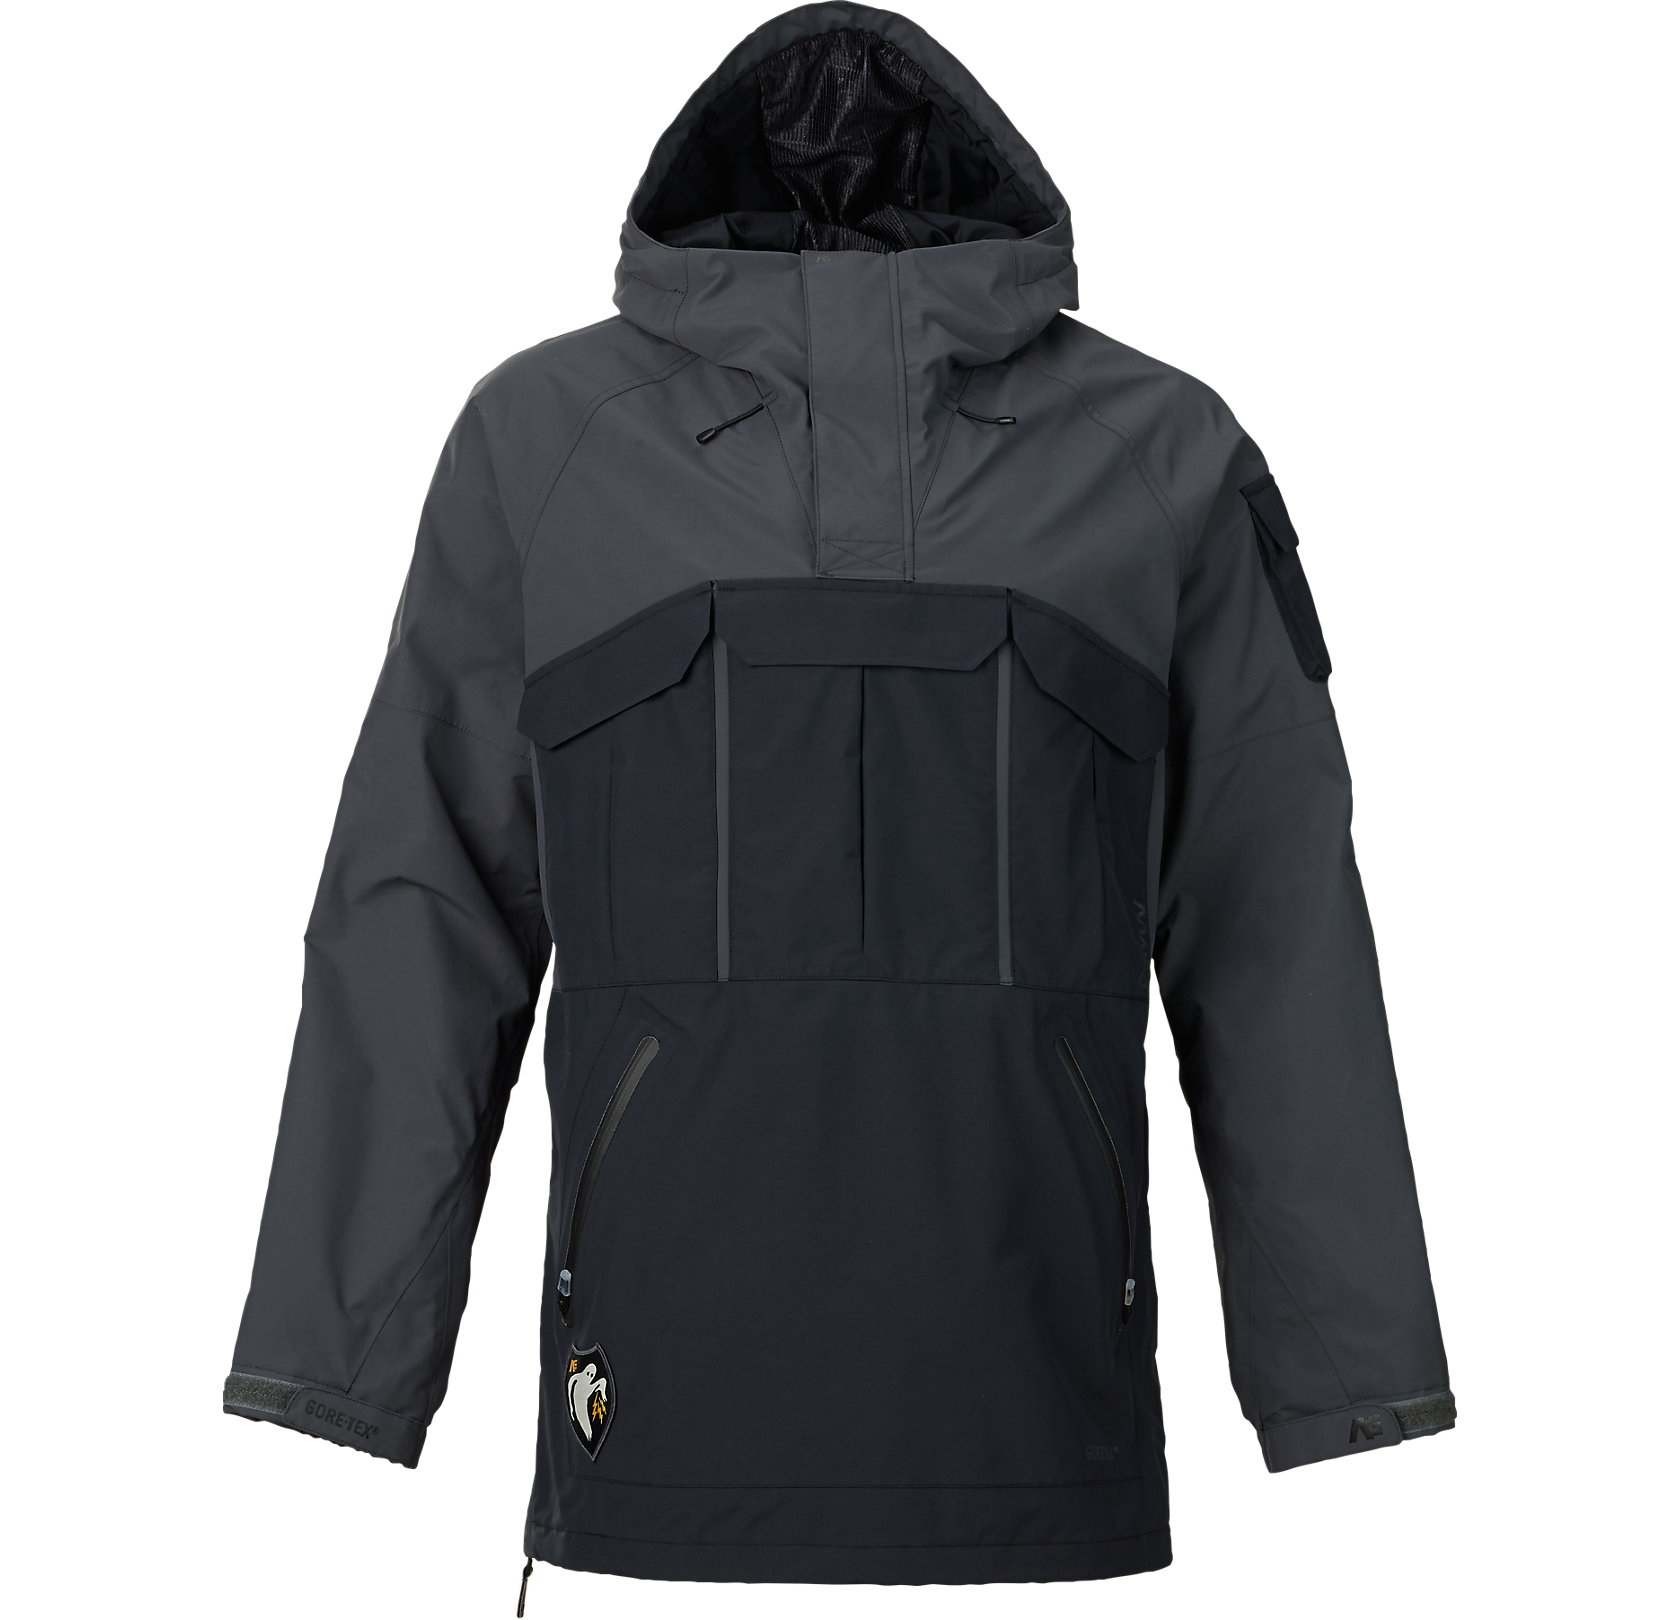 snowboard jackets analog highmark gore-tex snowboard jacket - thumbnail 1 RTEUDGT